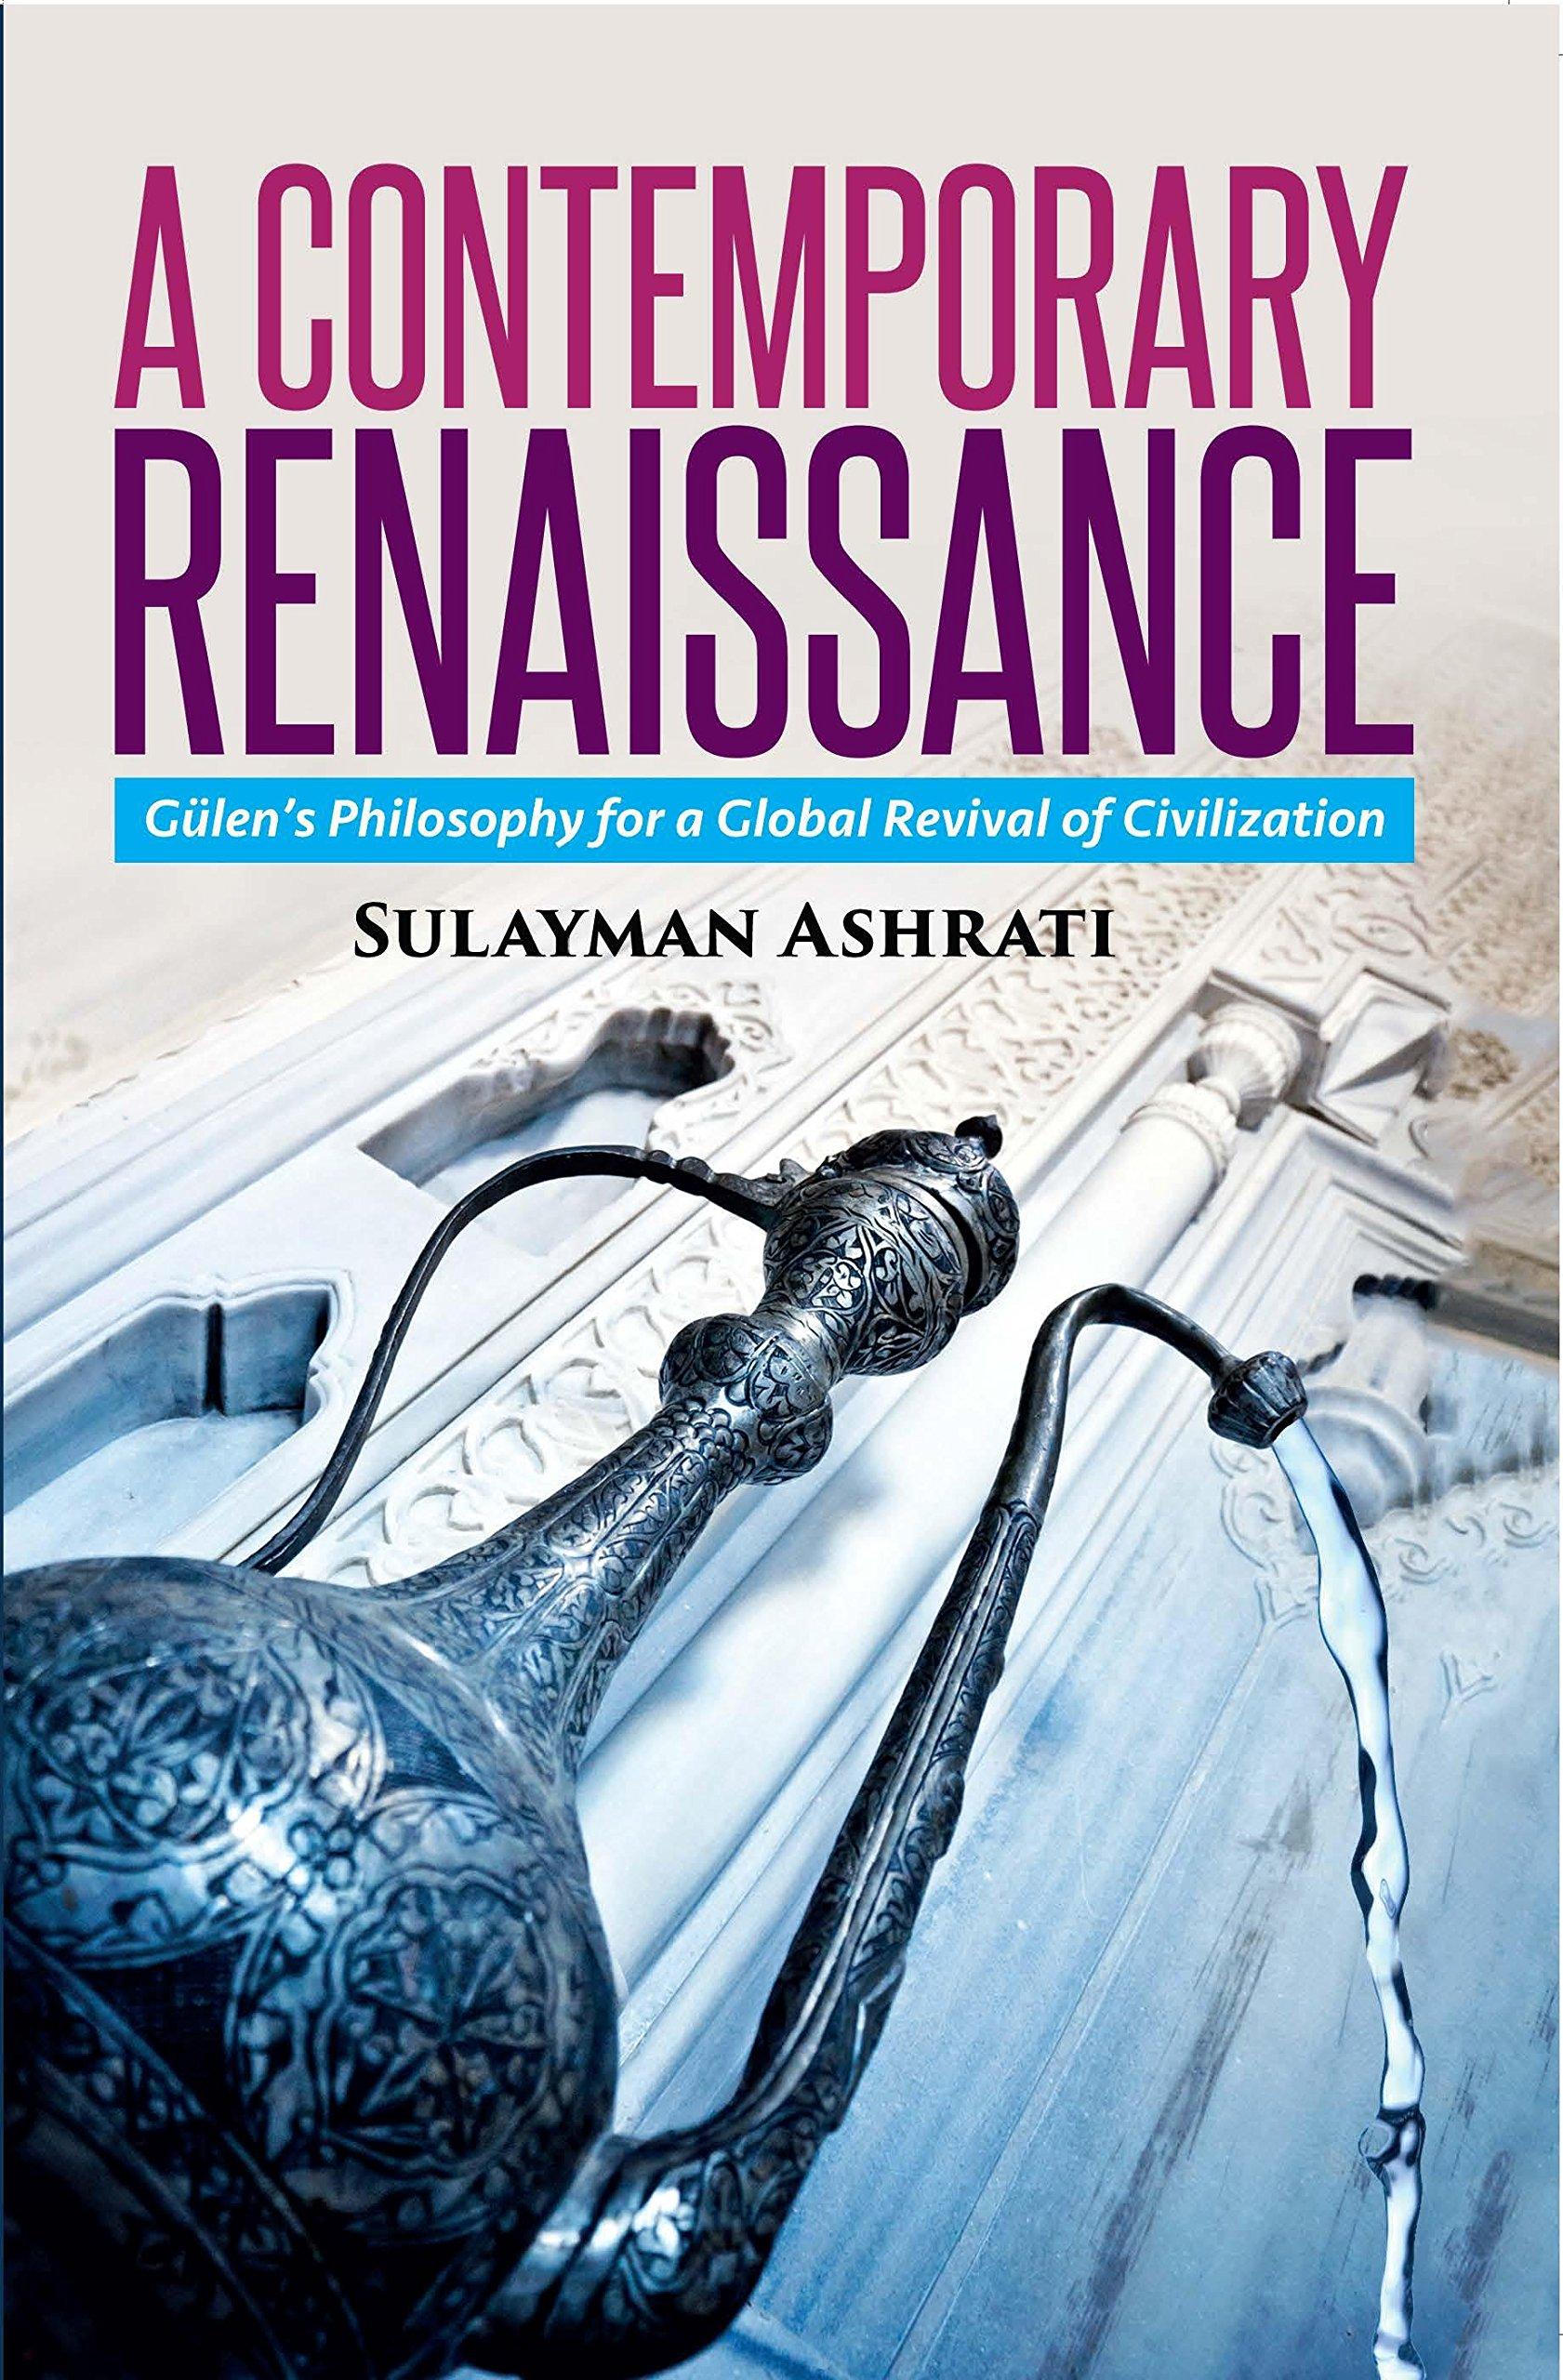 Contemporary Renaissance, Gulen's Philosophy For A Global Revival Of Civilization